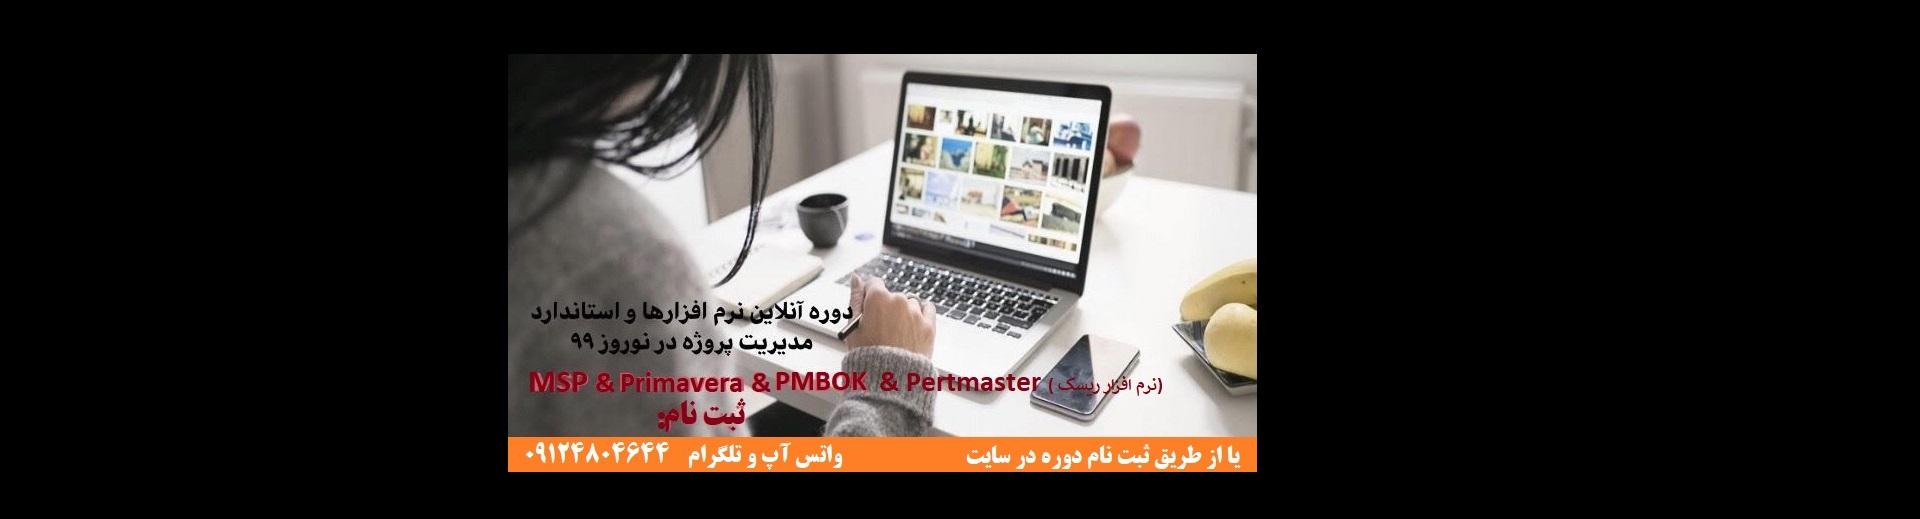 دوره آنلاین MSP,PRIMAVERA,PMBOK,PERTMASTER